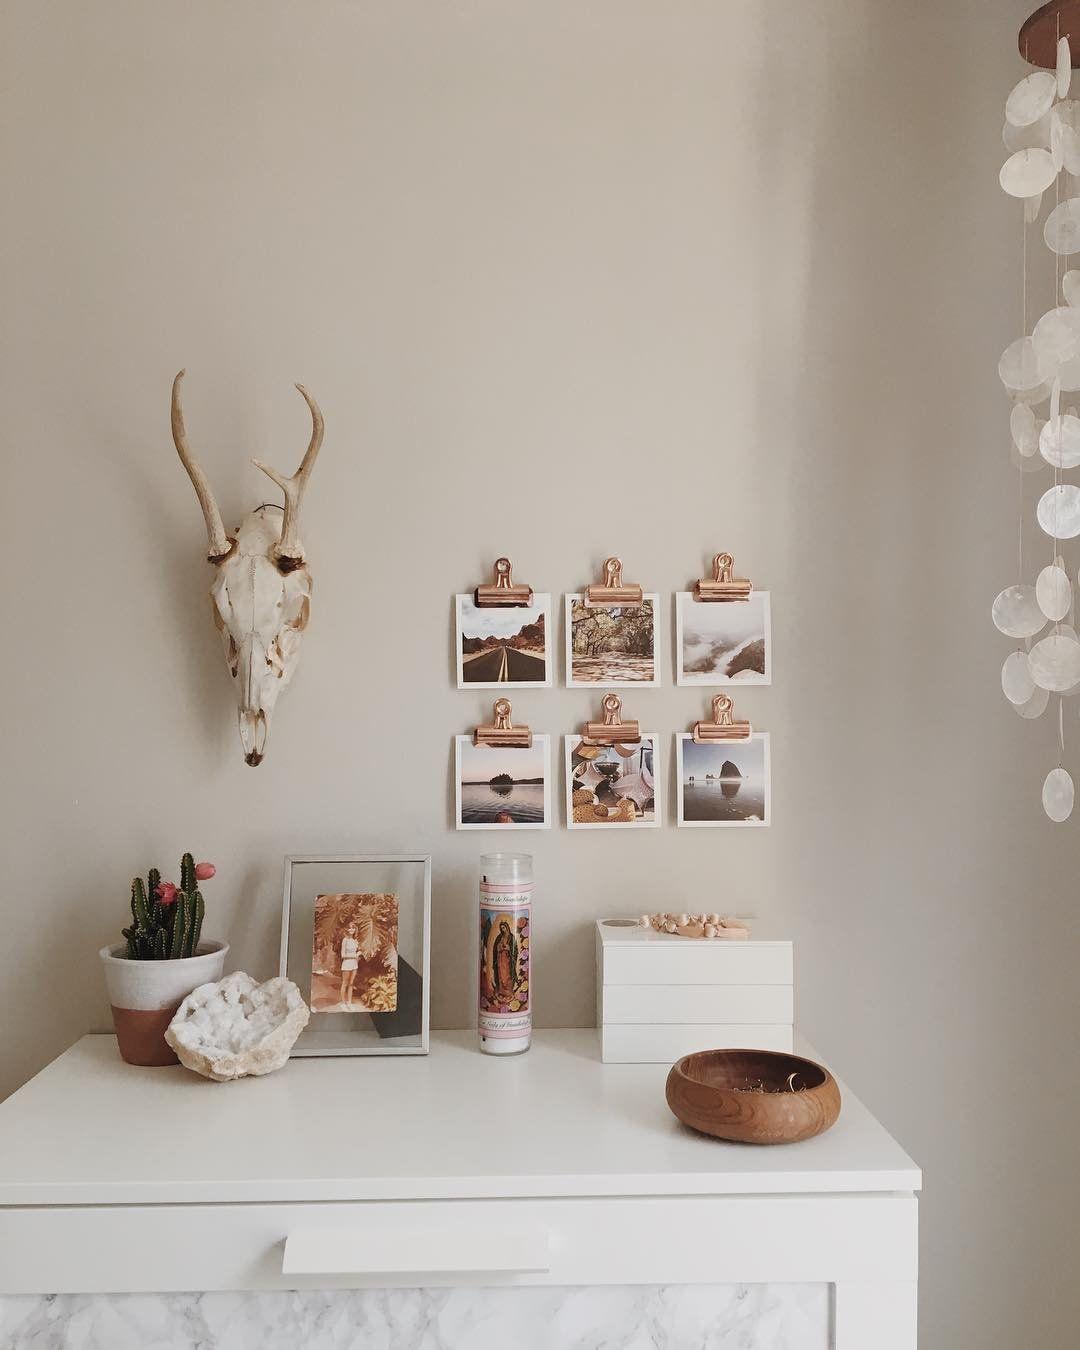 Nice and simple interior wall design livingroom handmade interiors interiordesign interiordesignideas design decor designideas architecture